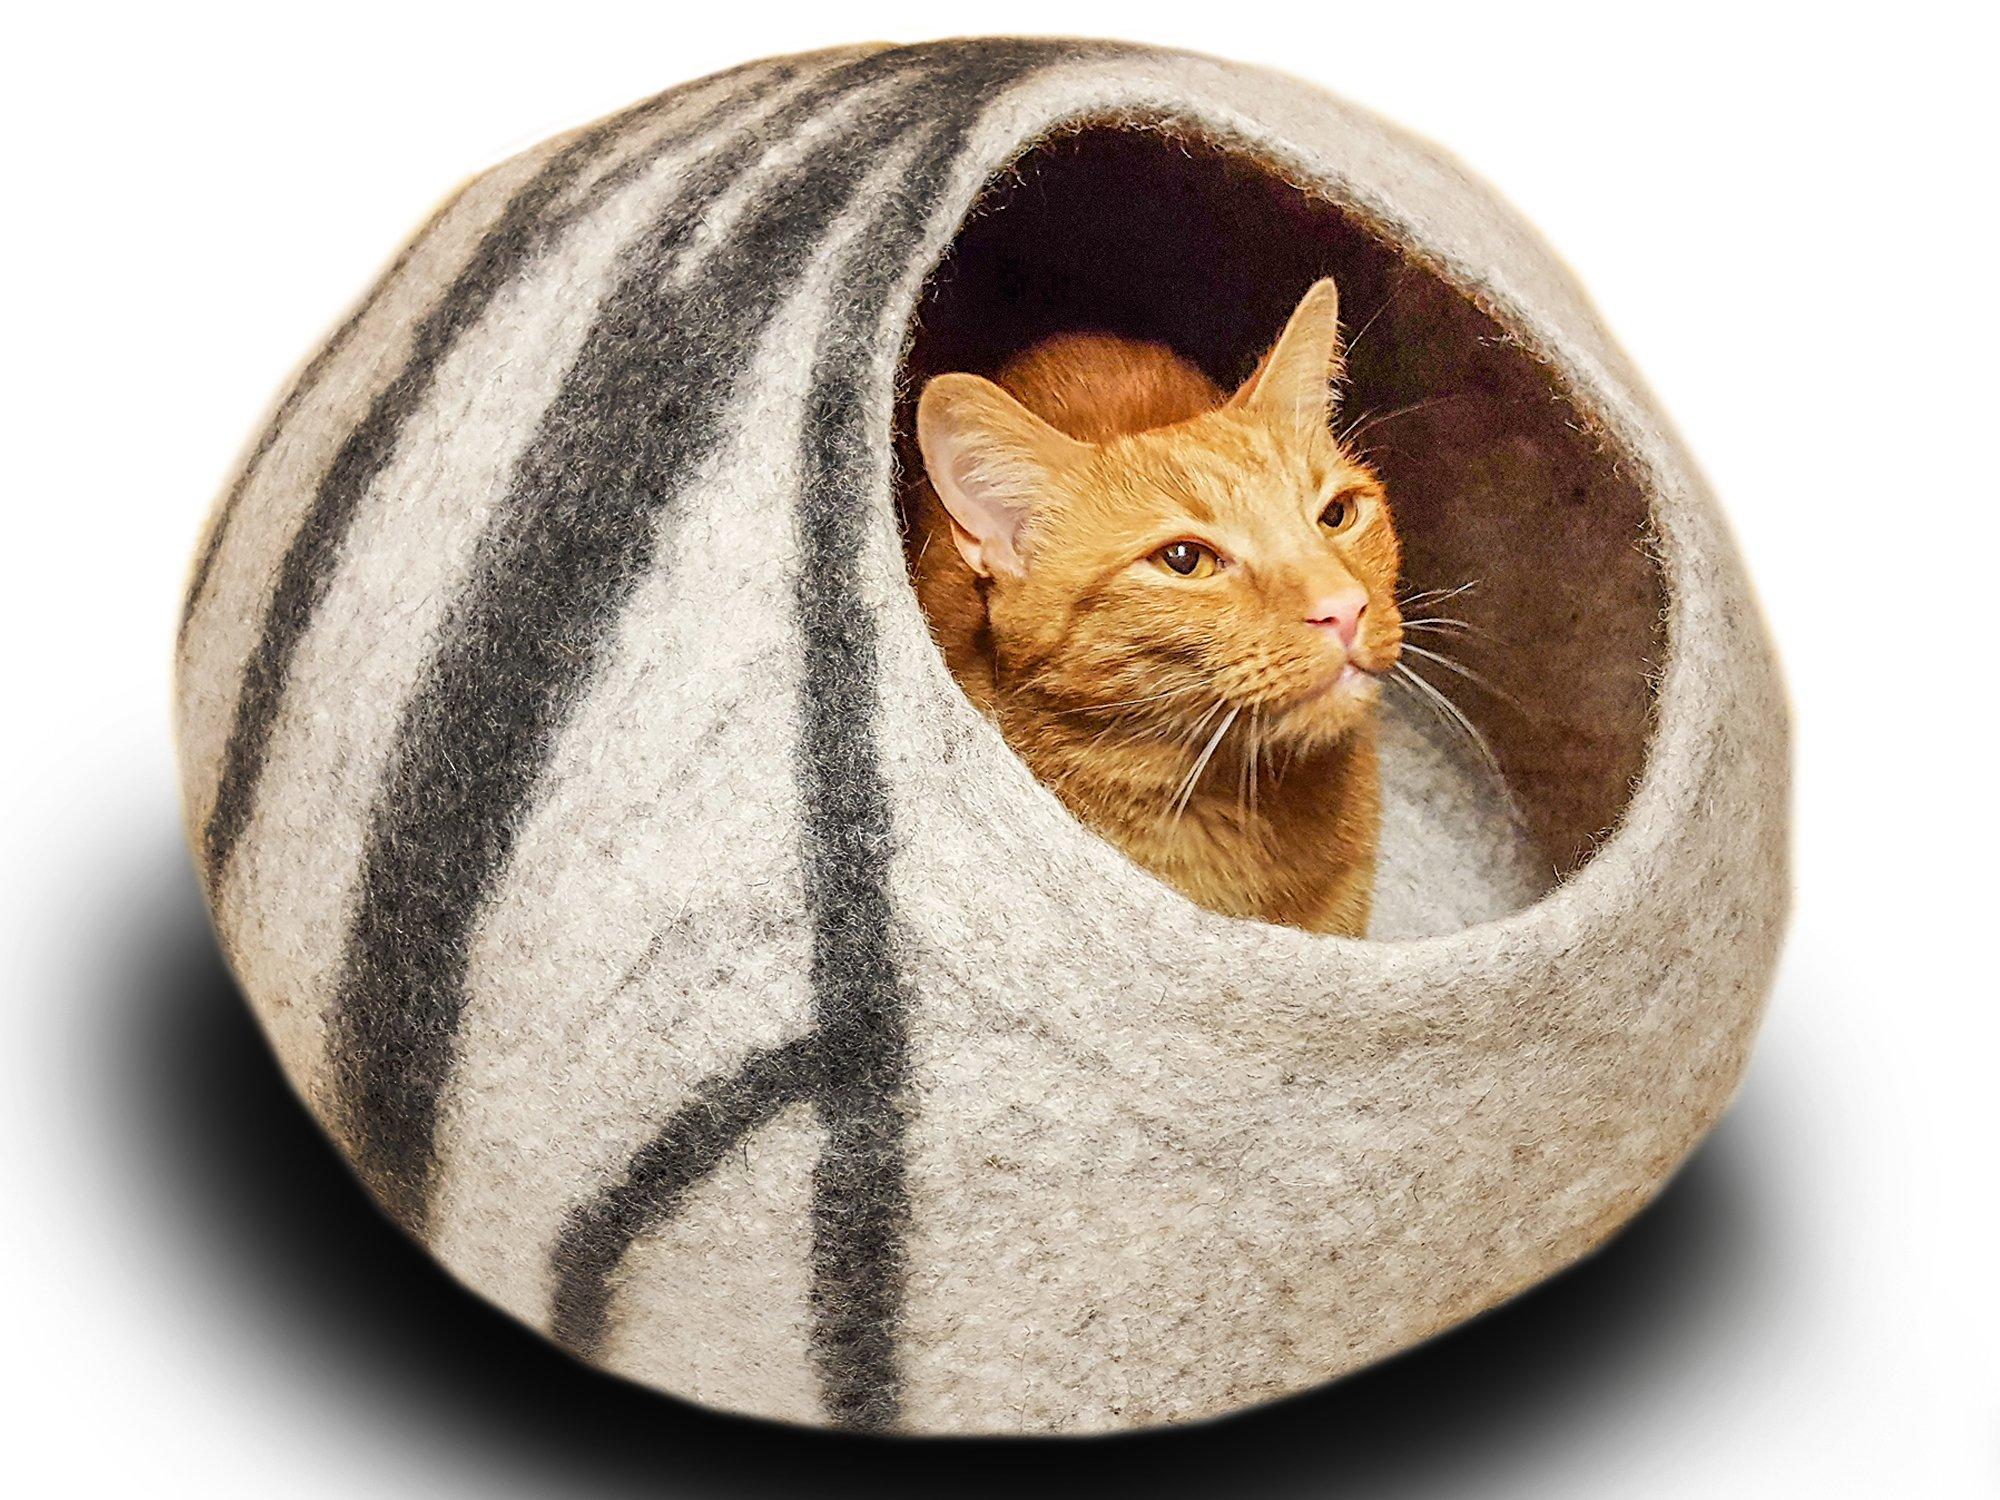 MEOWFIA Premium Felt Cat Bed Cave (Medium) - Handmade 100% Merino Wool Bed for Cats and Kittens (Light Grey/Medium) by MEOWFIA